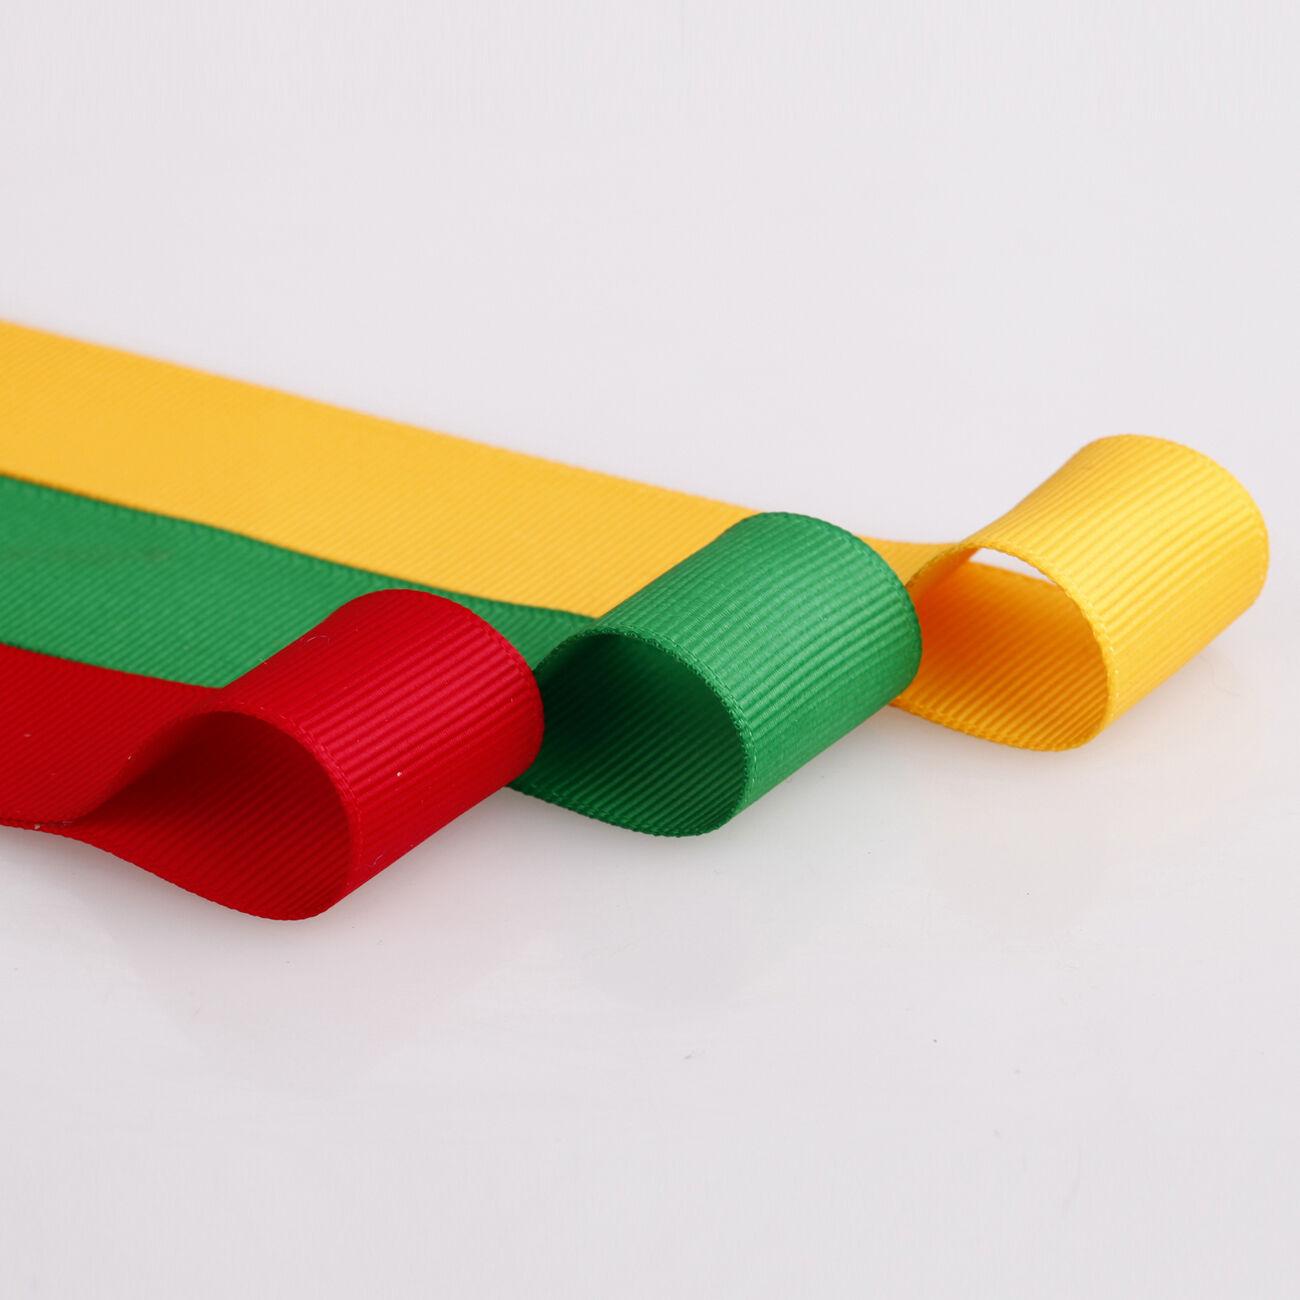 Jamaica jamaican flag 16 mm grosgrain cake board gift decorating Textiles ribbon